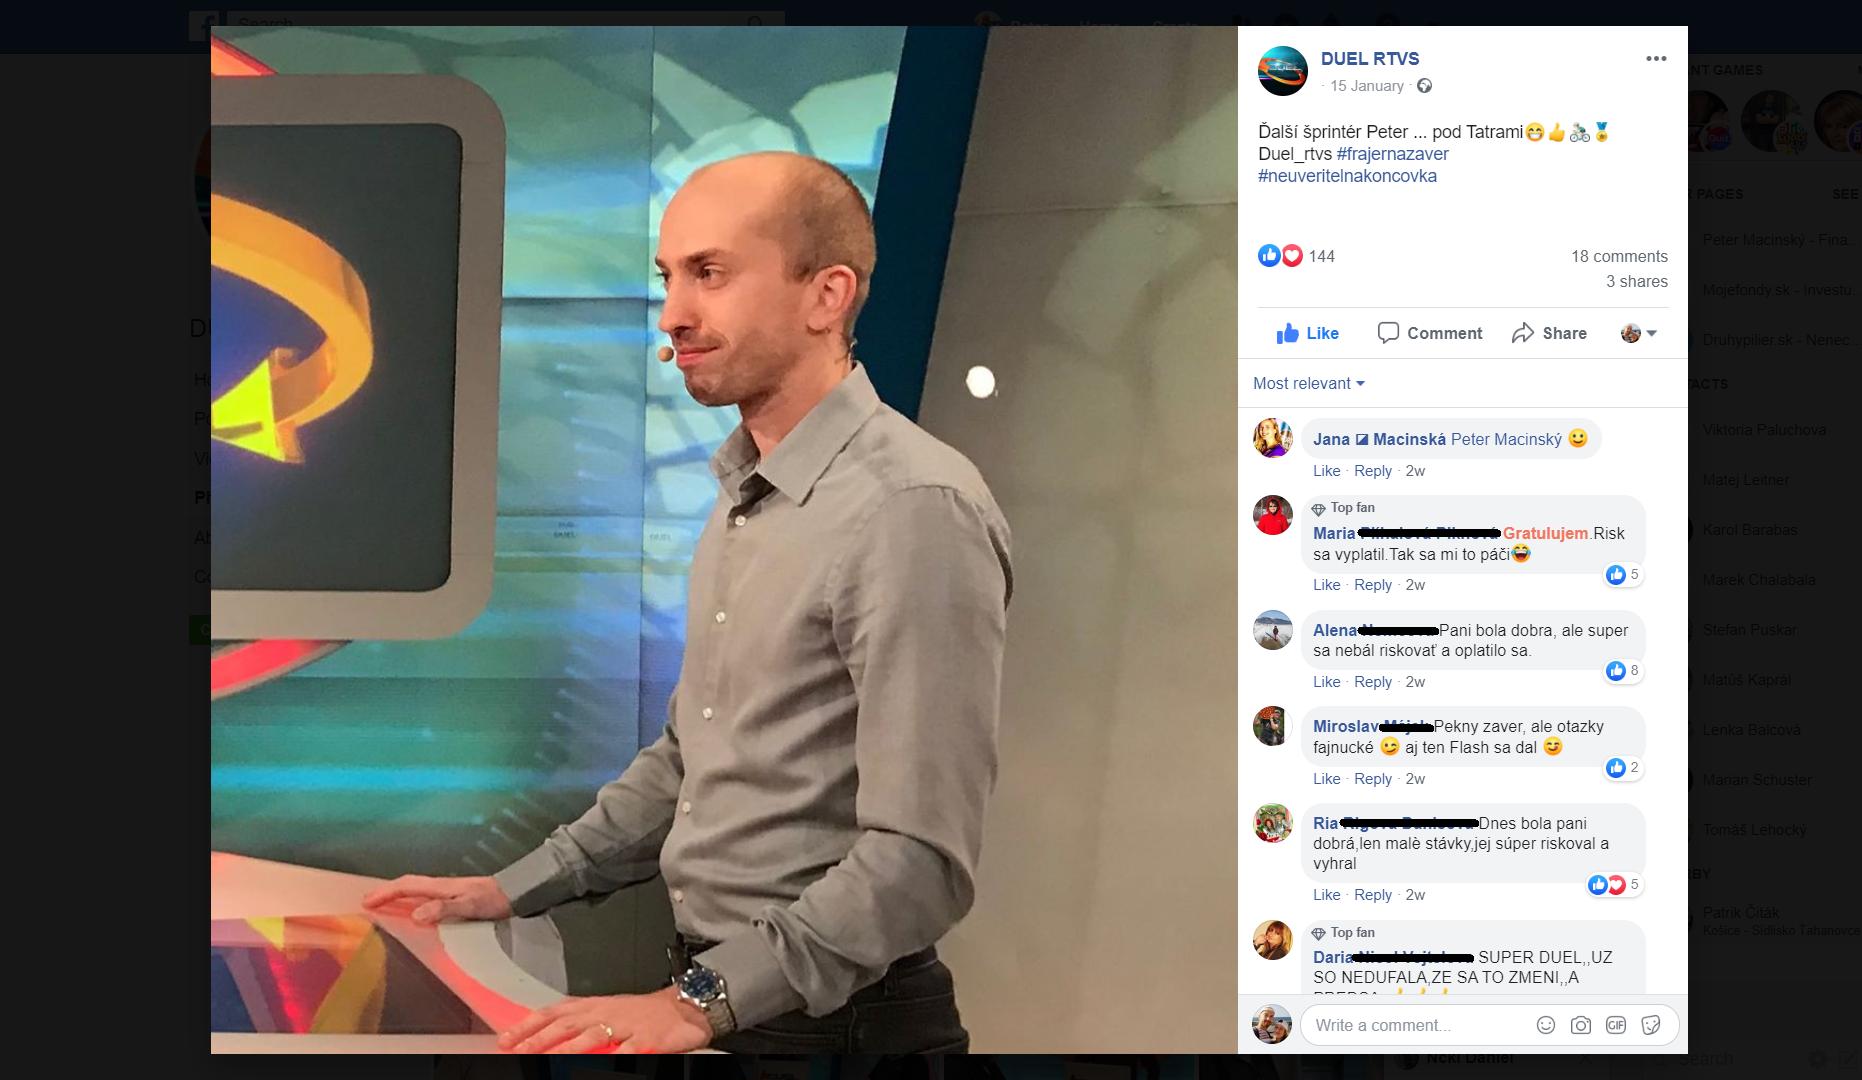 FB RTVS Duel post